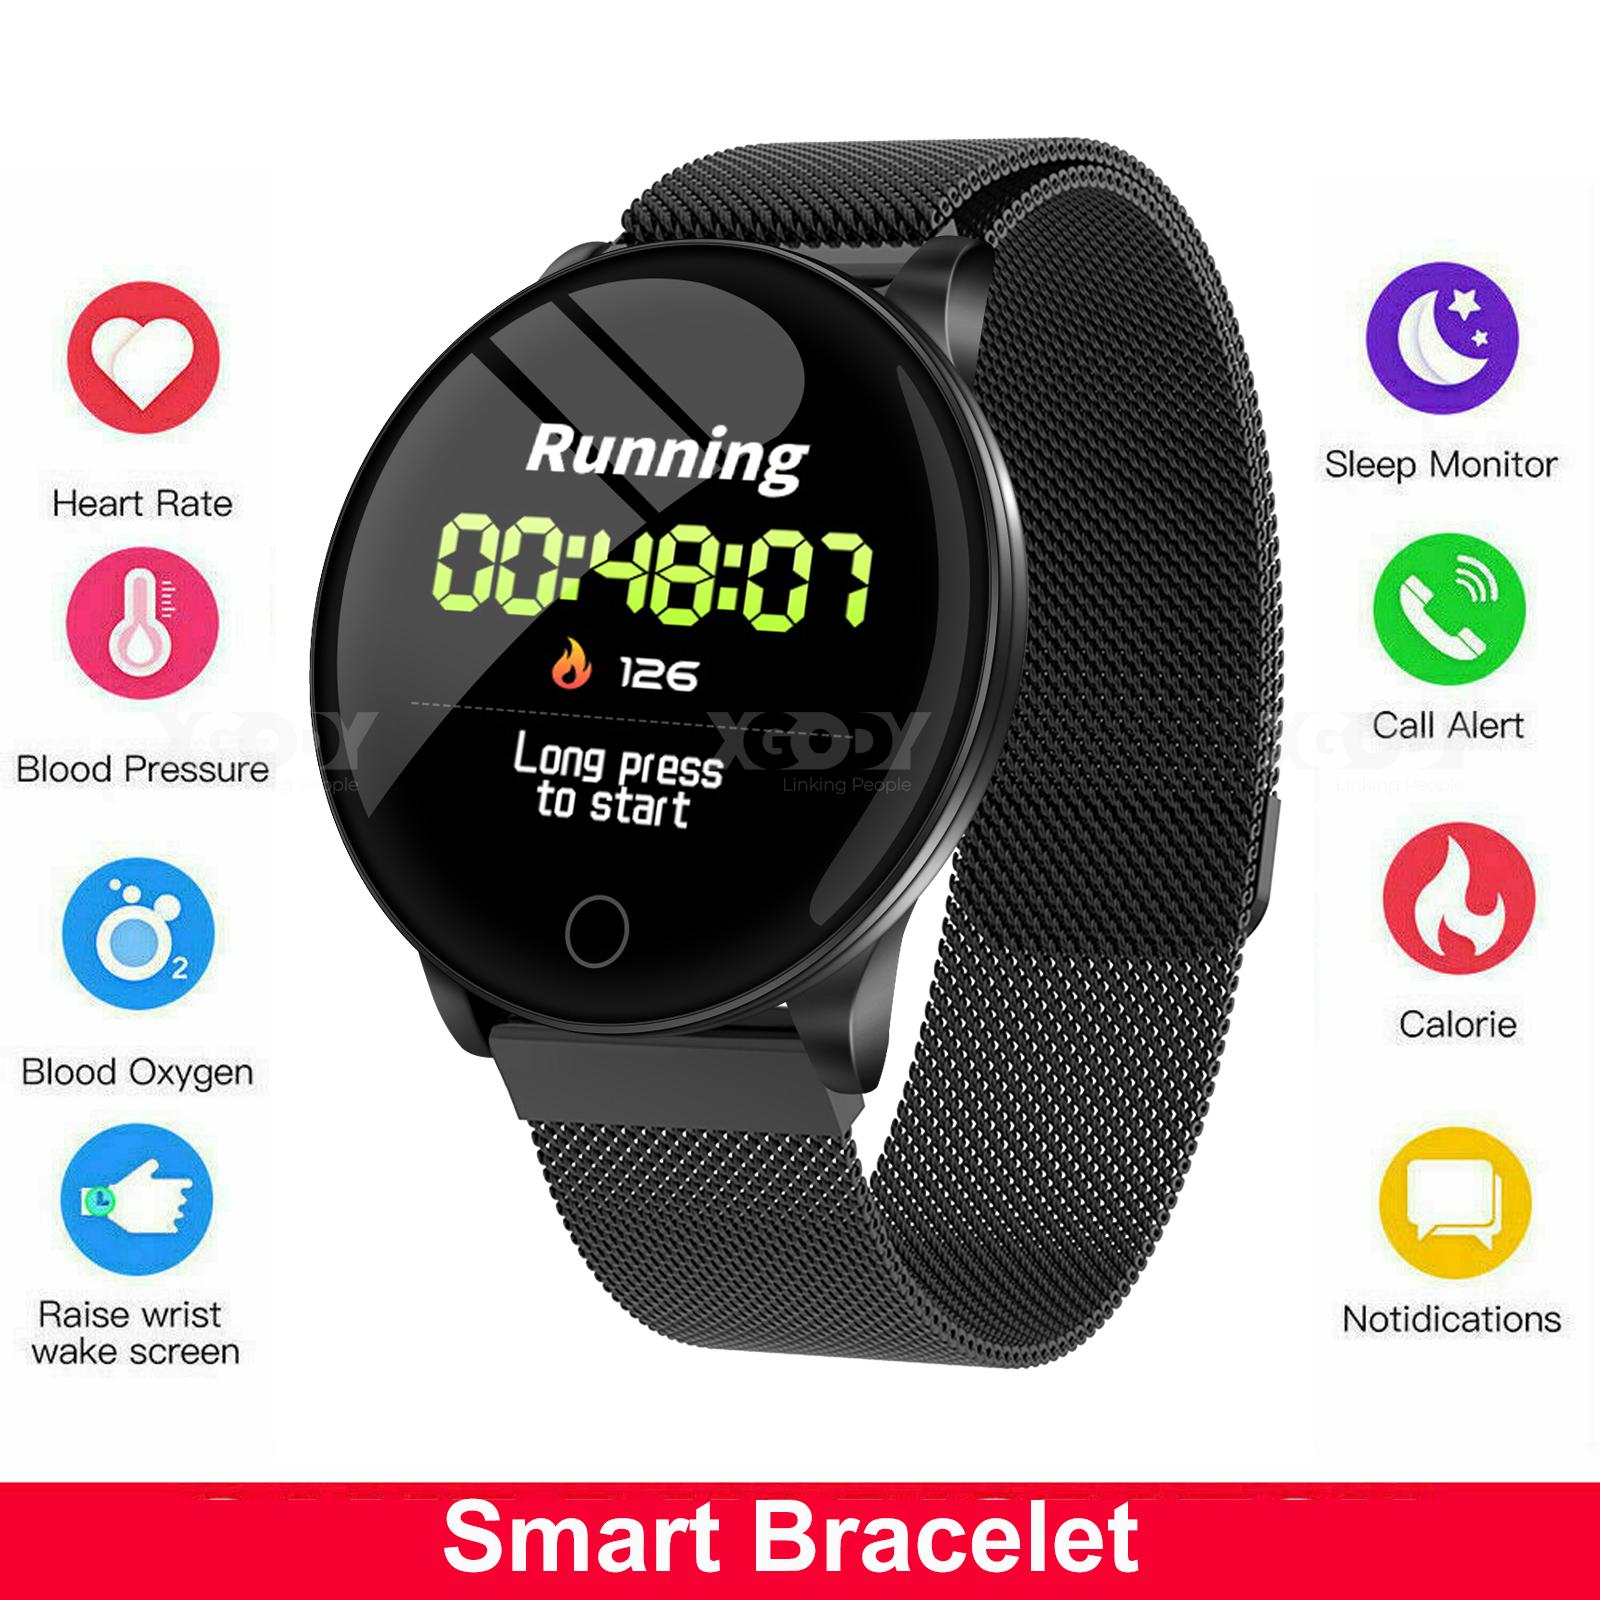 XGODY IP67 Heart Rate Smart Watch Sleep Blood Oxygen Fitness Tracker Sport Watch blood Featured fitness heart ip67 oxygen rate sleep smart watch xgody